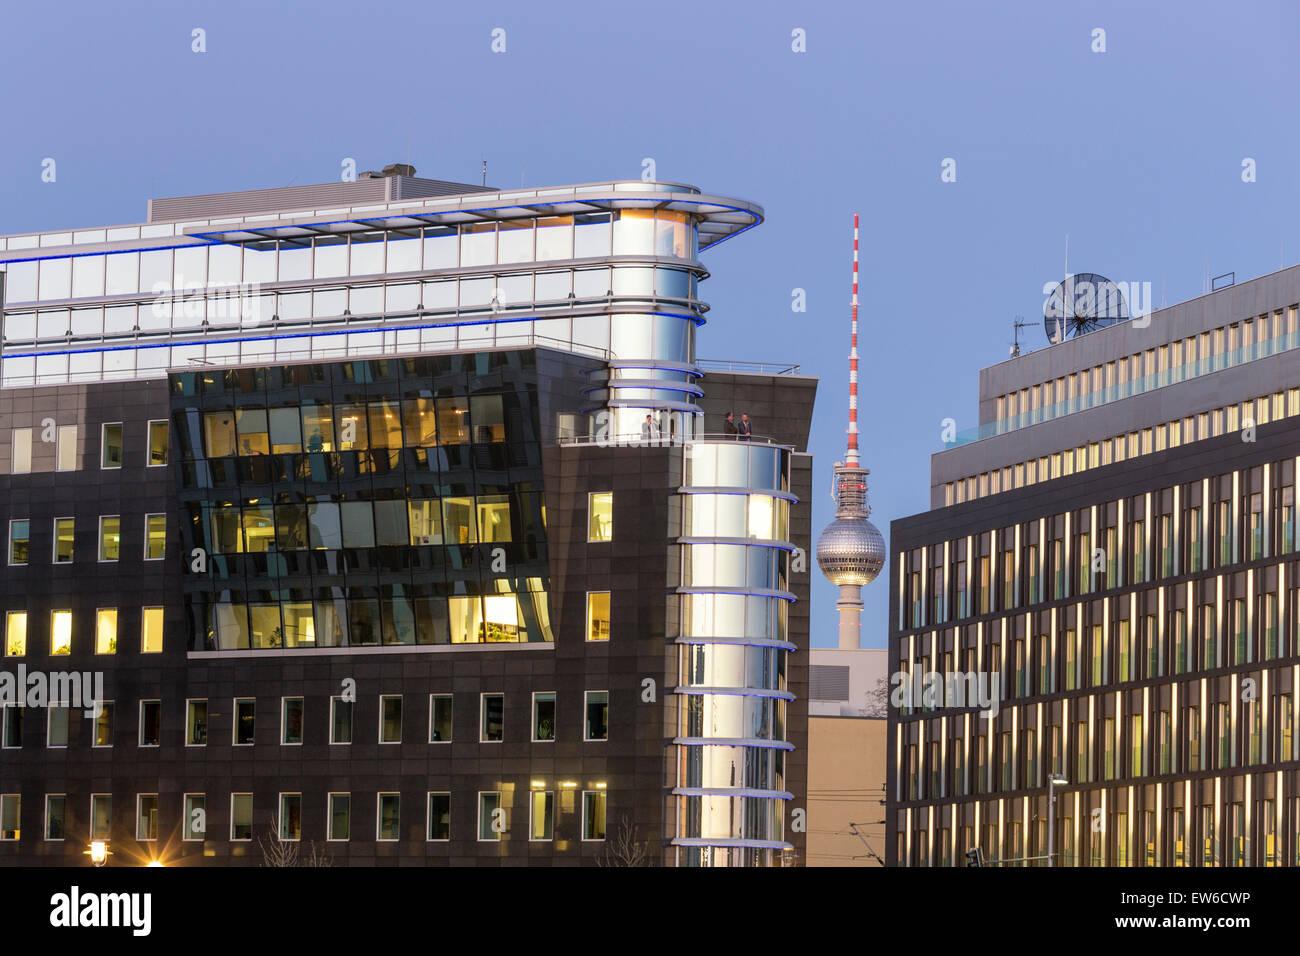 Arquitectura moderna, Alex Torre de Televisión, Berlín , Alemania Imagen De Stock